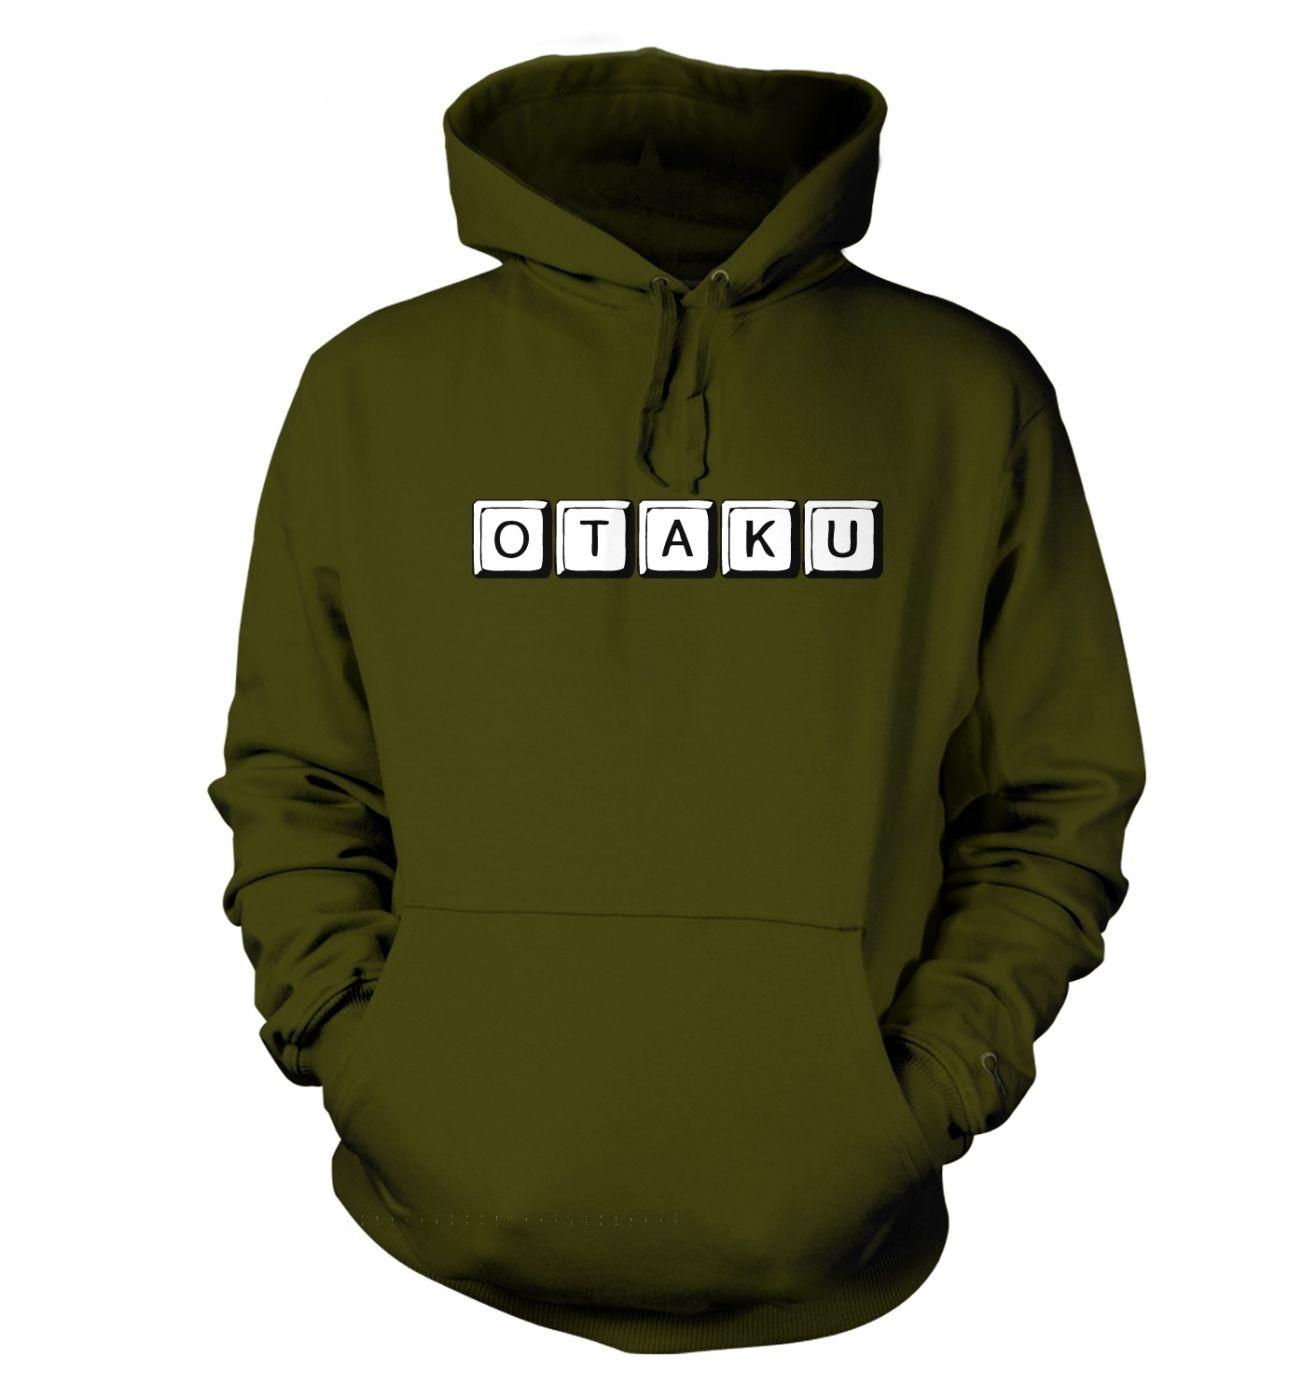 Japanese 'Otaku' hoodie